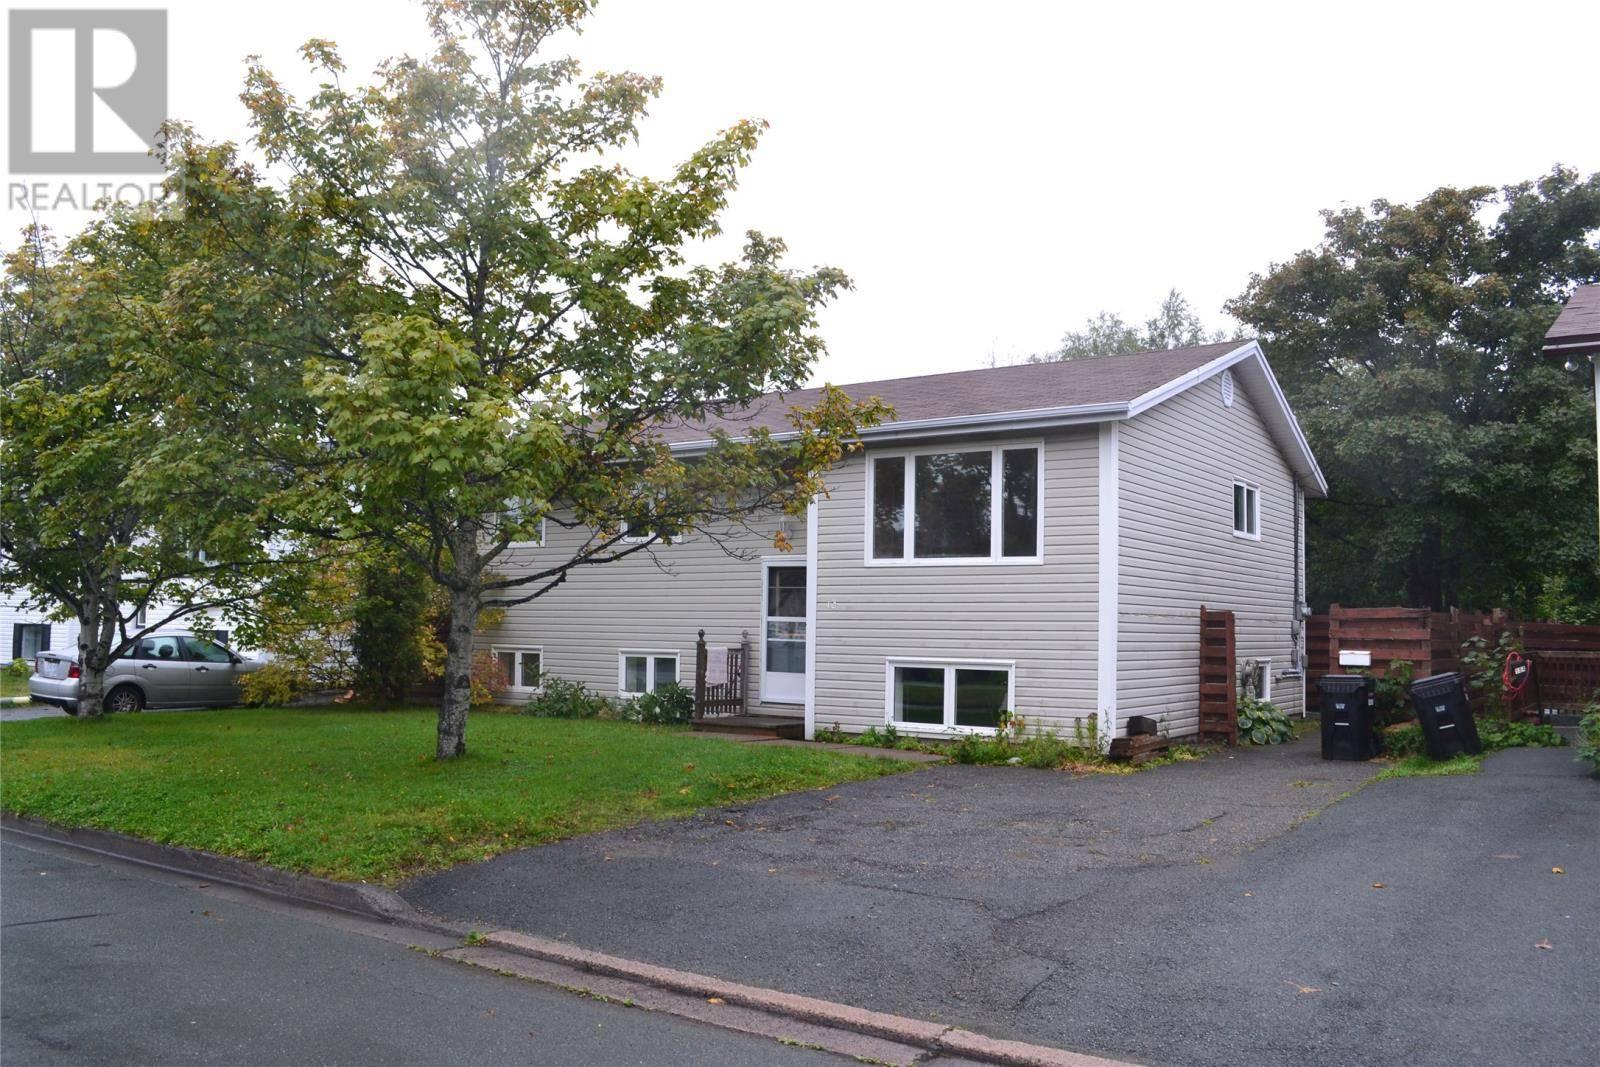 House for sale at 13 Eastmeadows Ave St. John's Newfoundland - MLS: 1210034